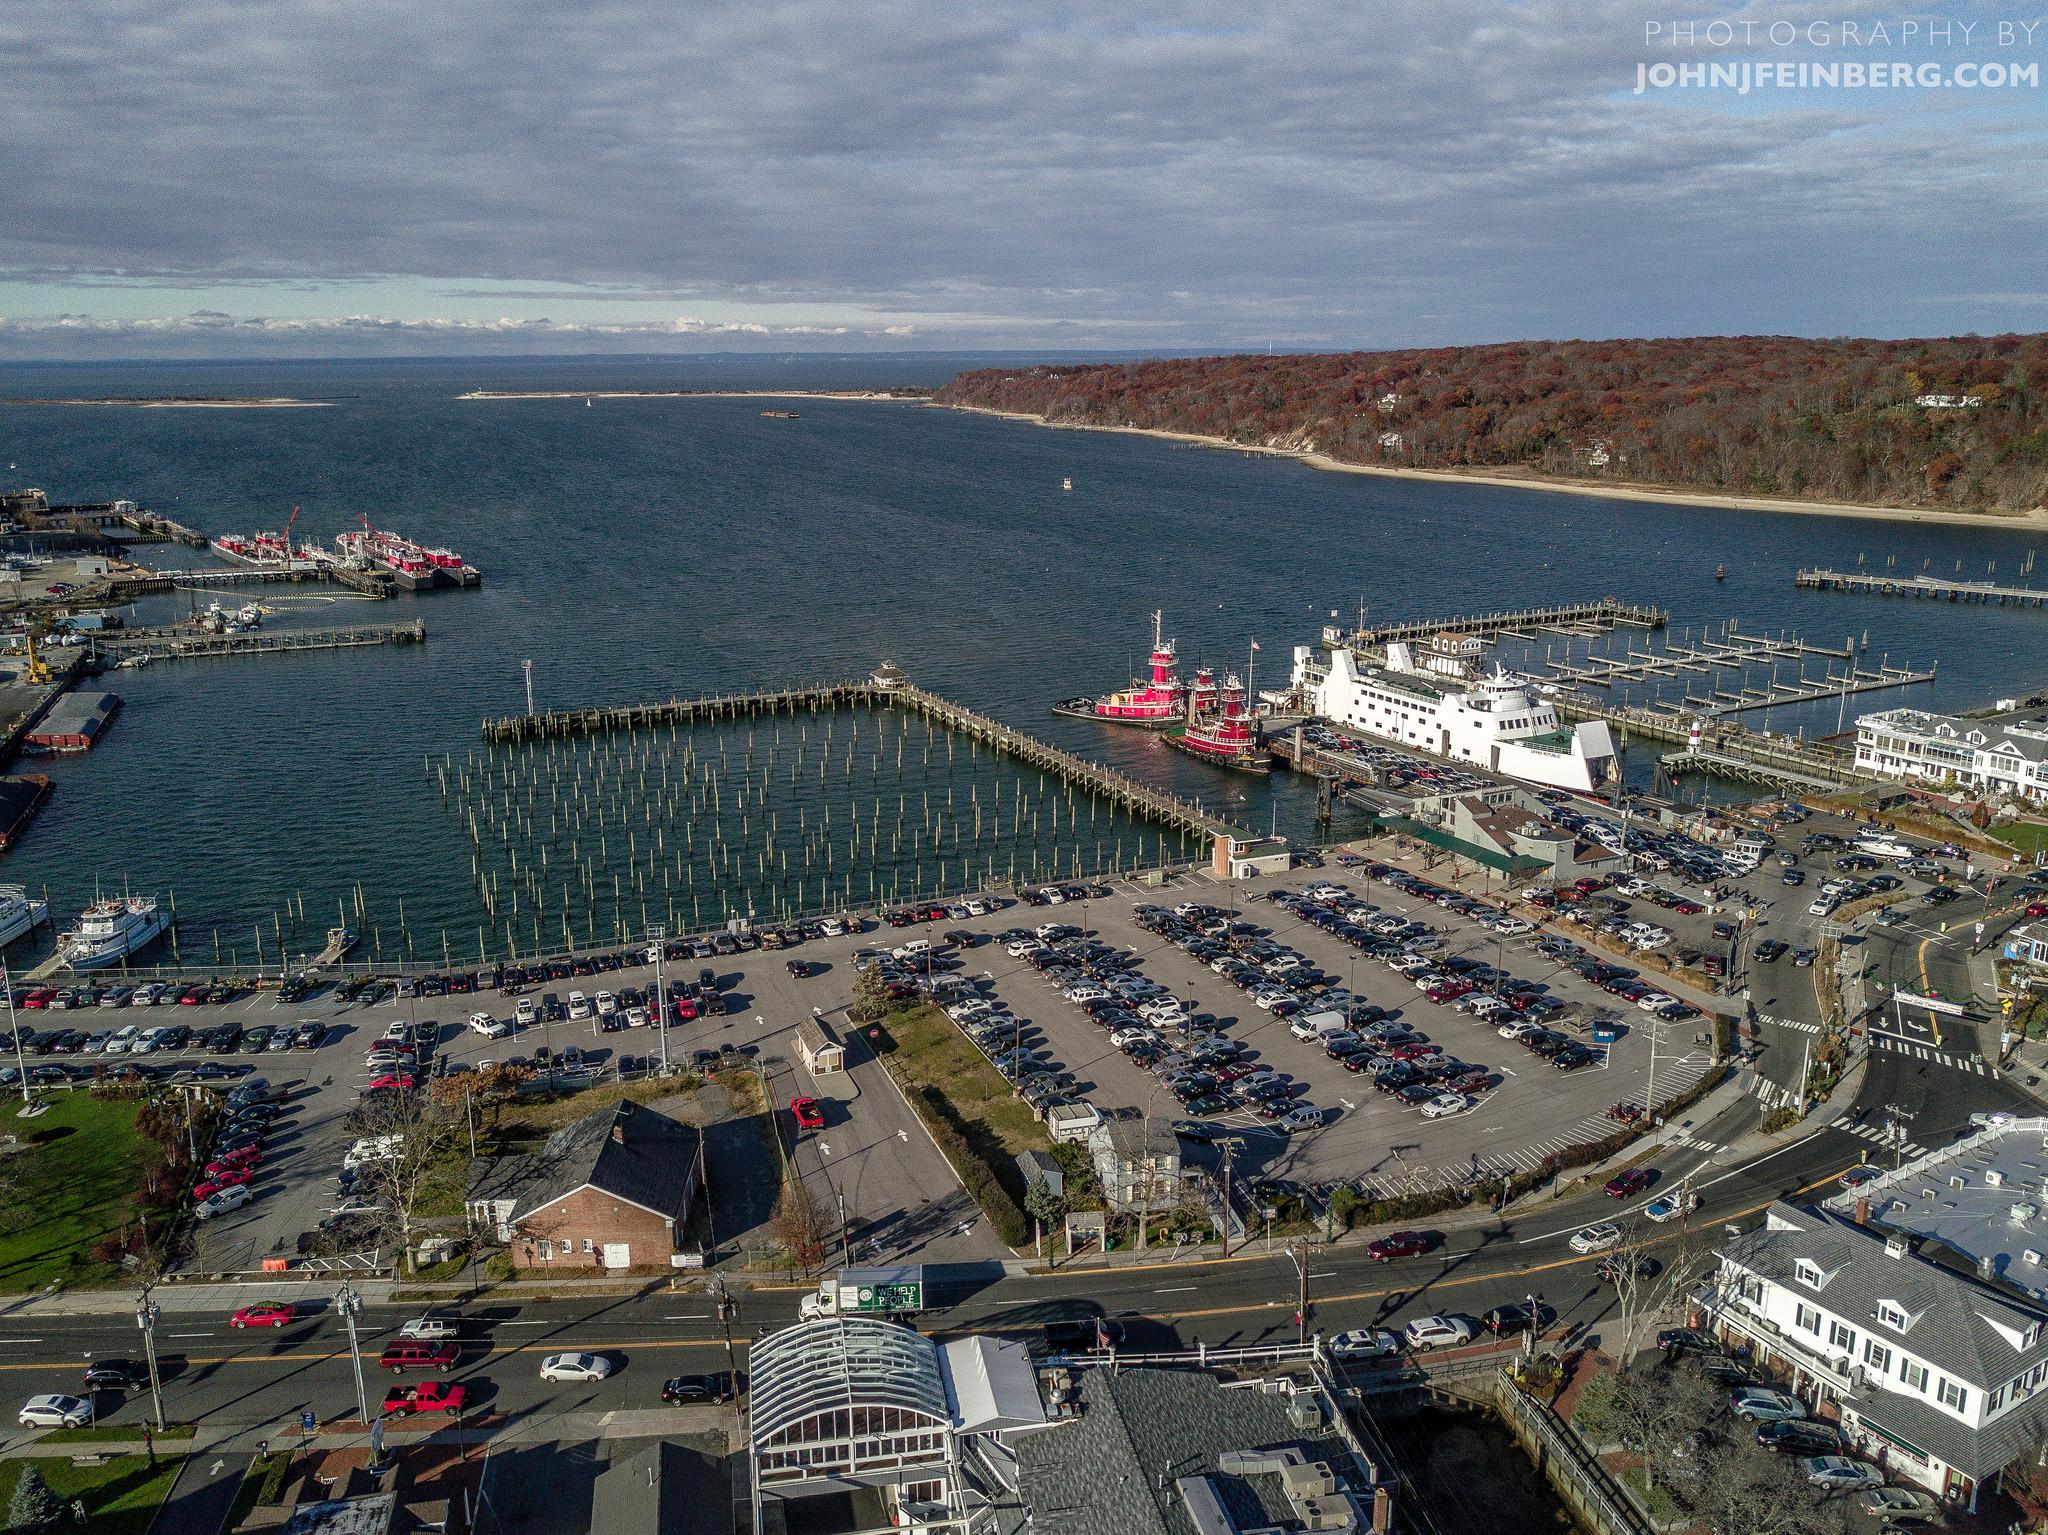 Port Jefferson, N.Y. Photo by John Feinberg